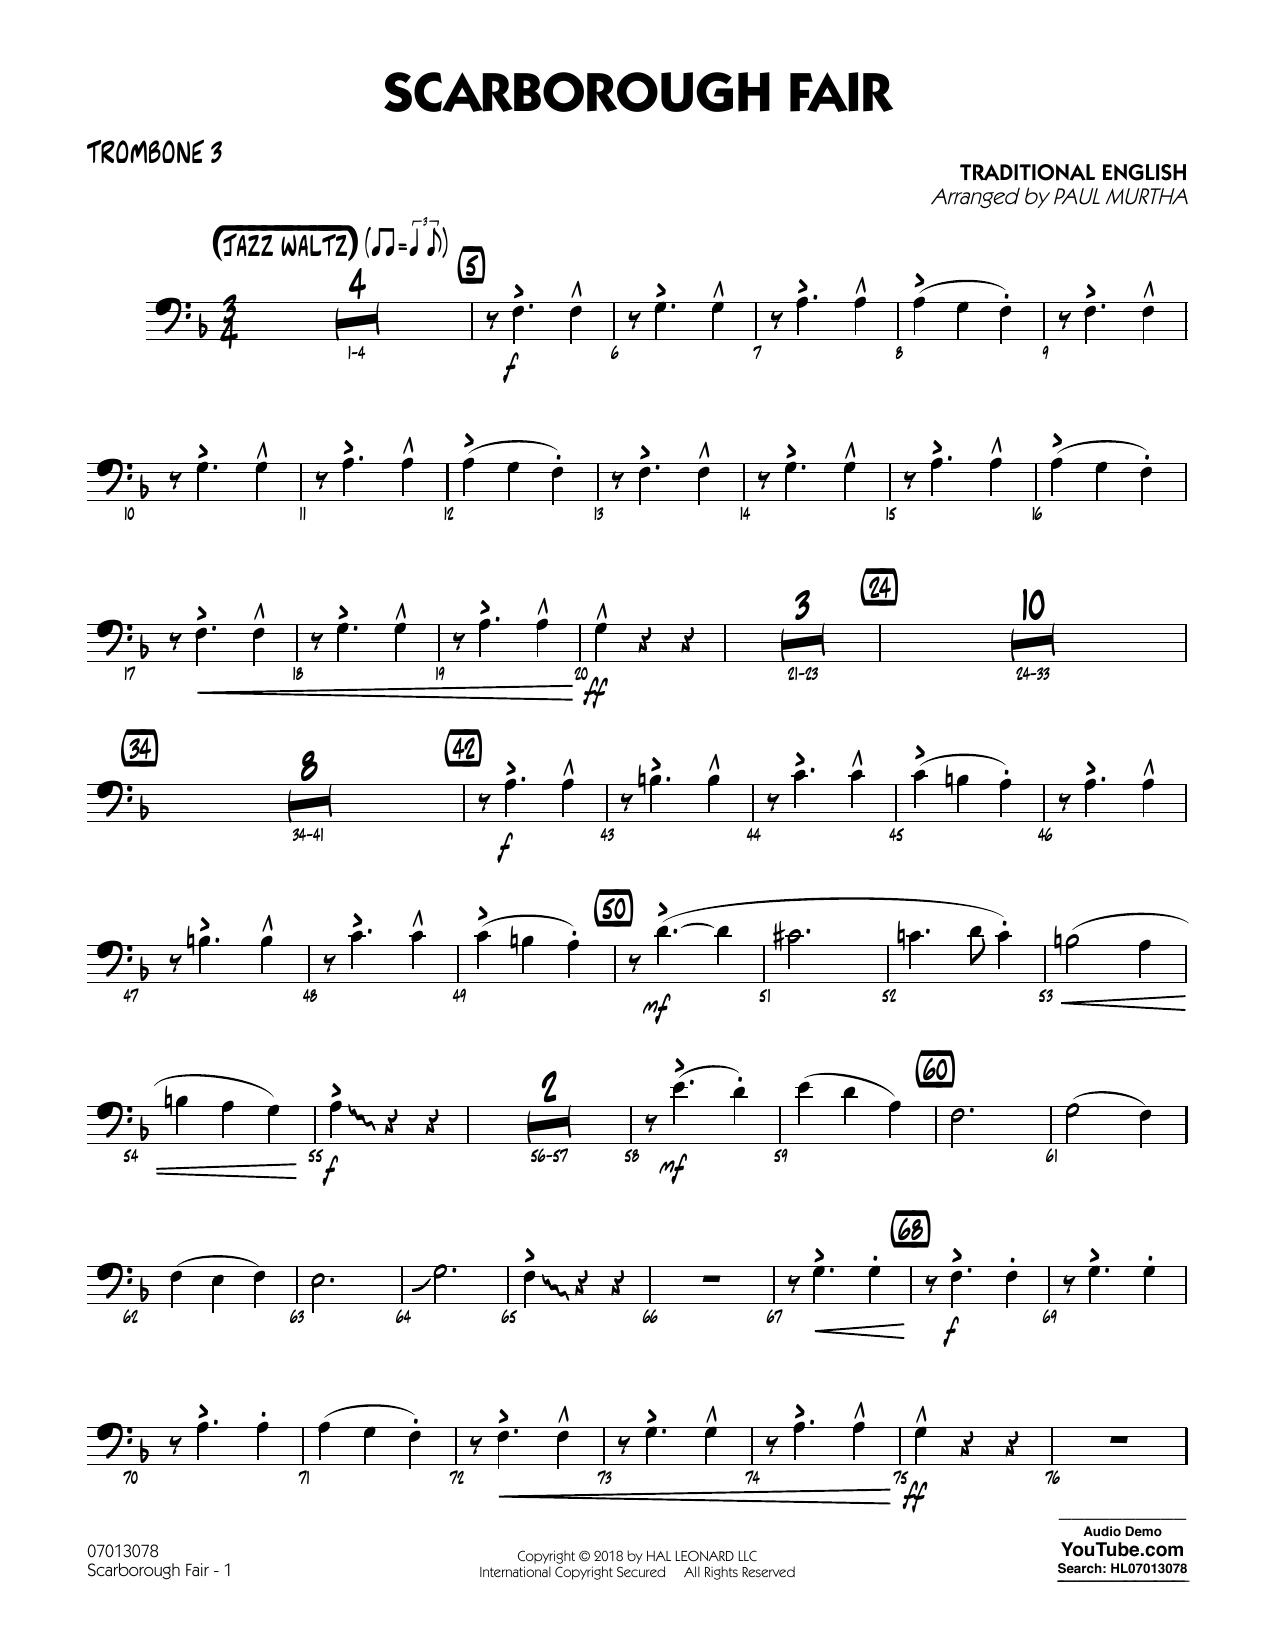 Paul Murtha Scarborough Fair - Trombone 3 sheet music notes and chords. Download Printable PDF.